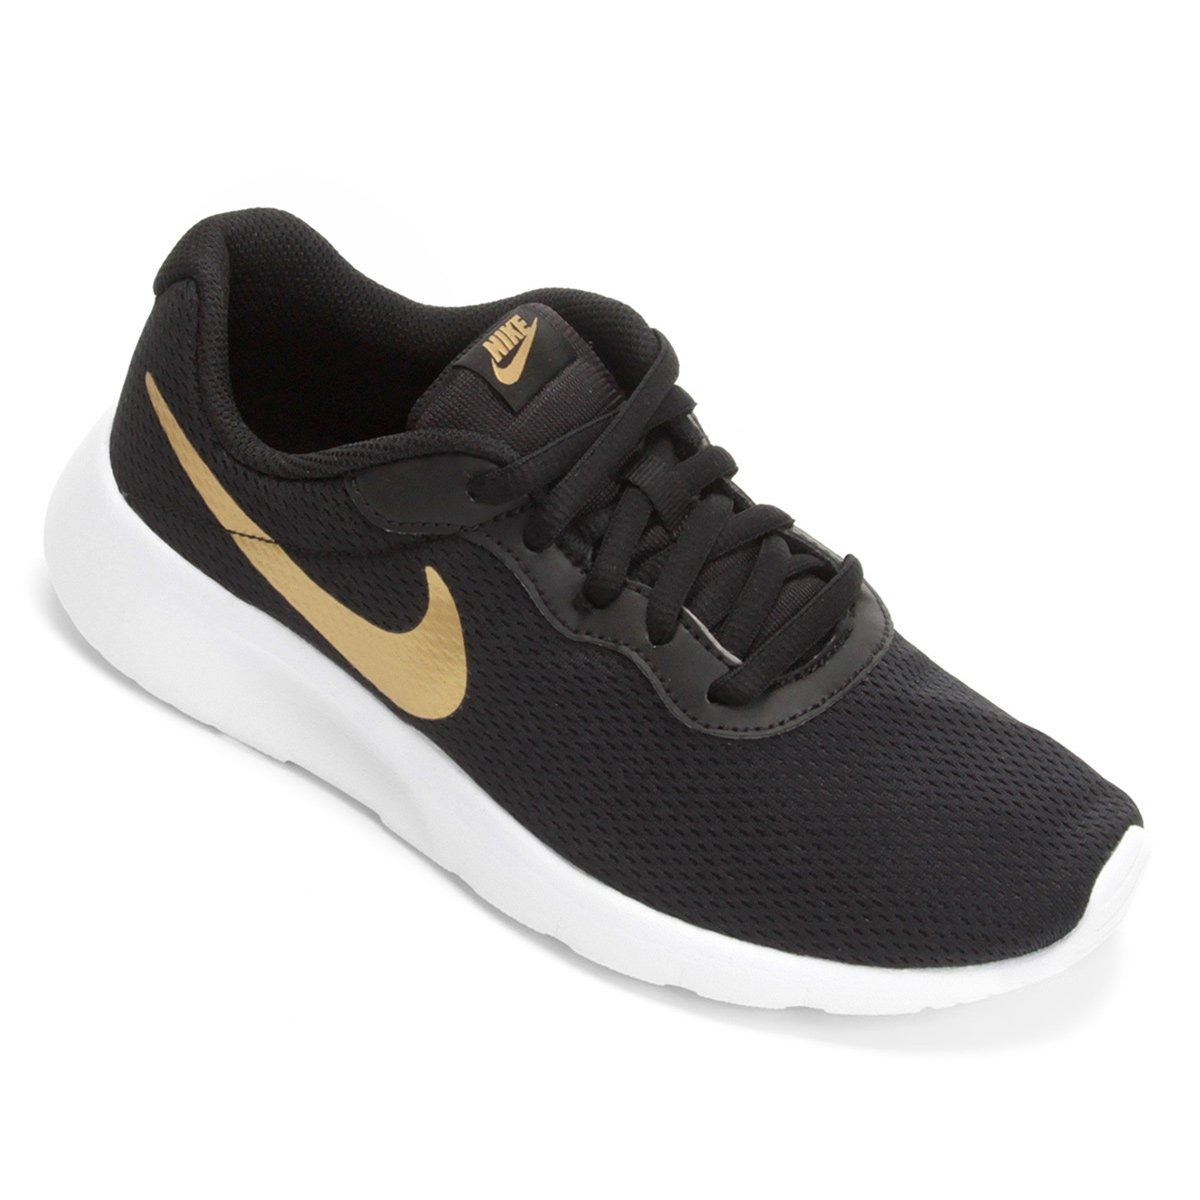 lähemmäs ostaa halpaa eri tavalla Tenis Nike Tanjun (gs) Juvenil Infantil 818381-016 - 35 - Pr